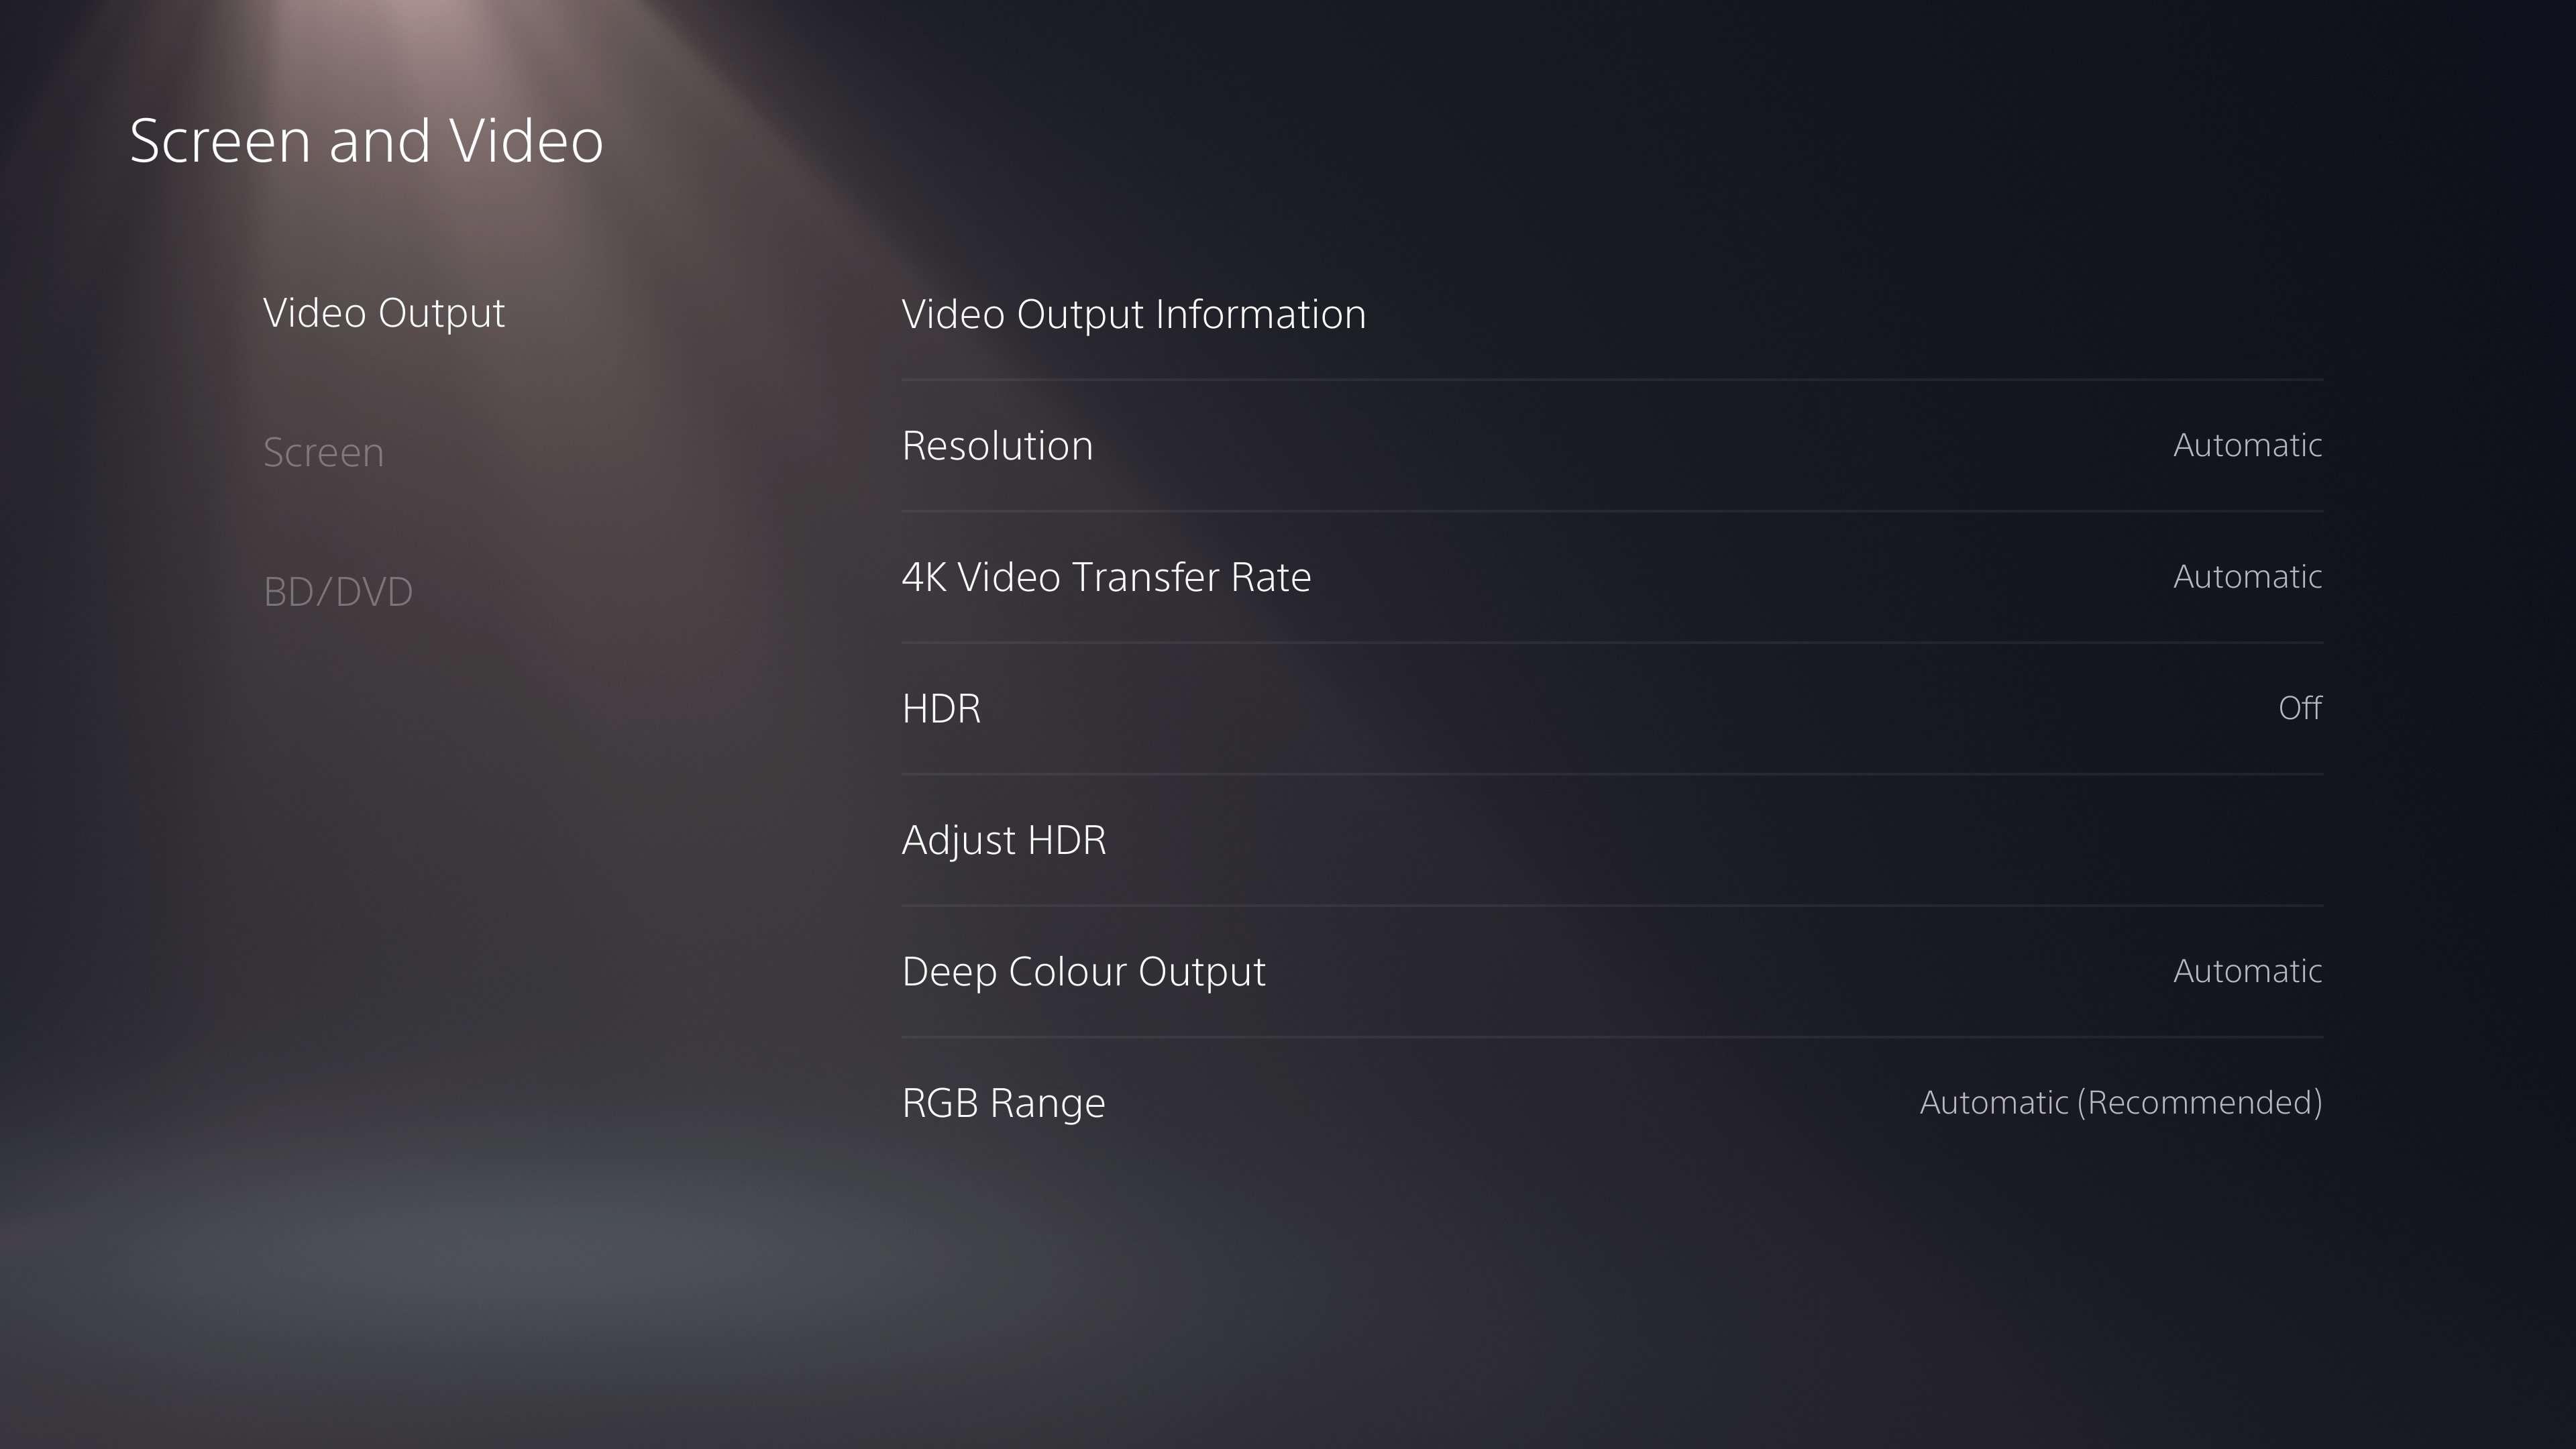 Screen and Video options in PS5 settings menu